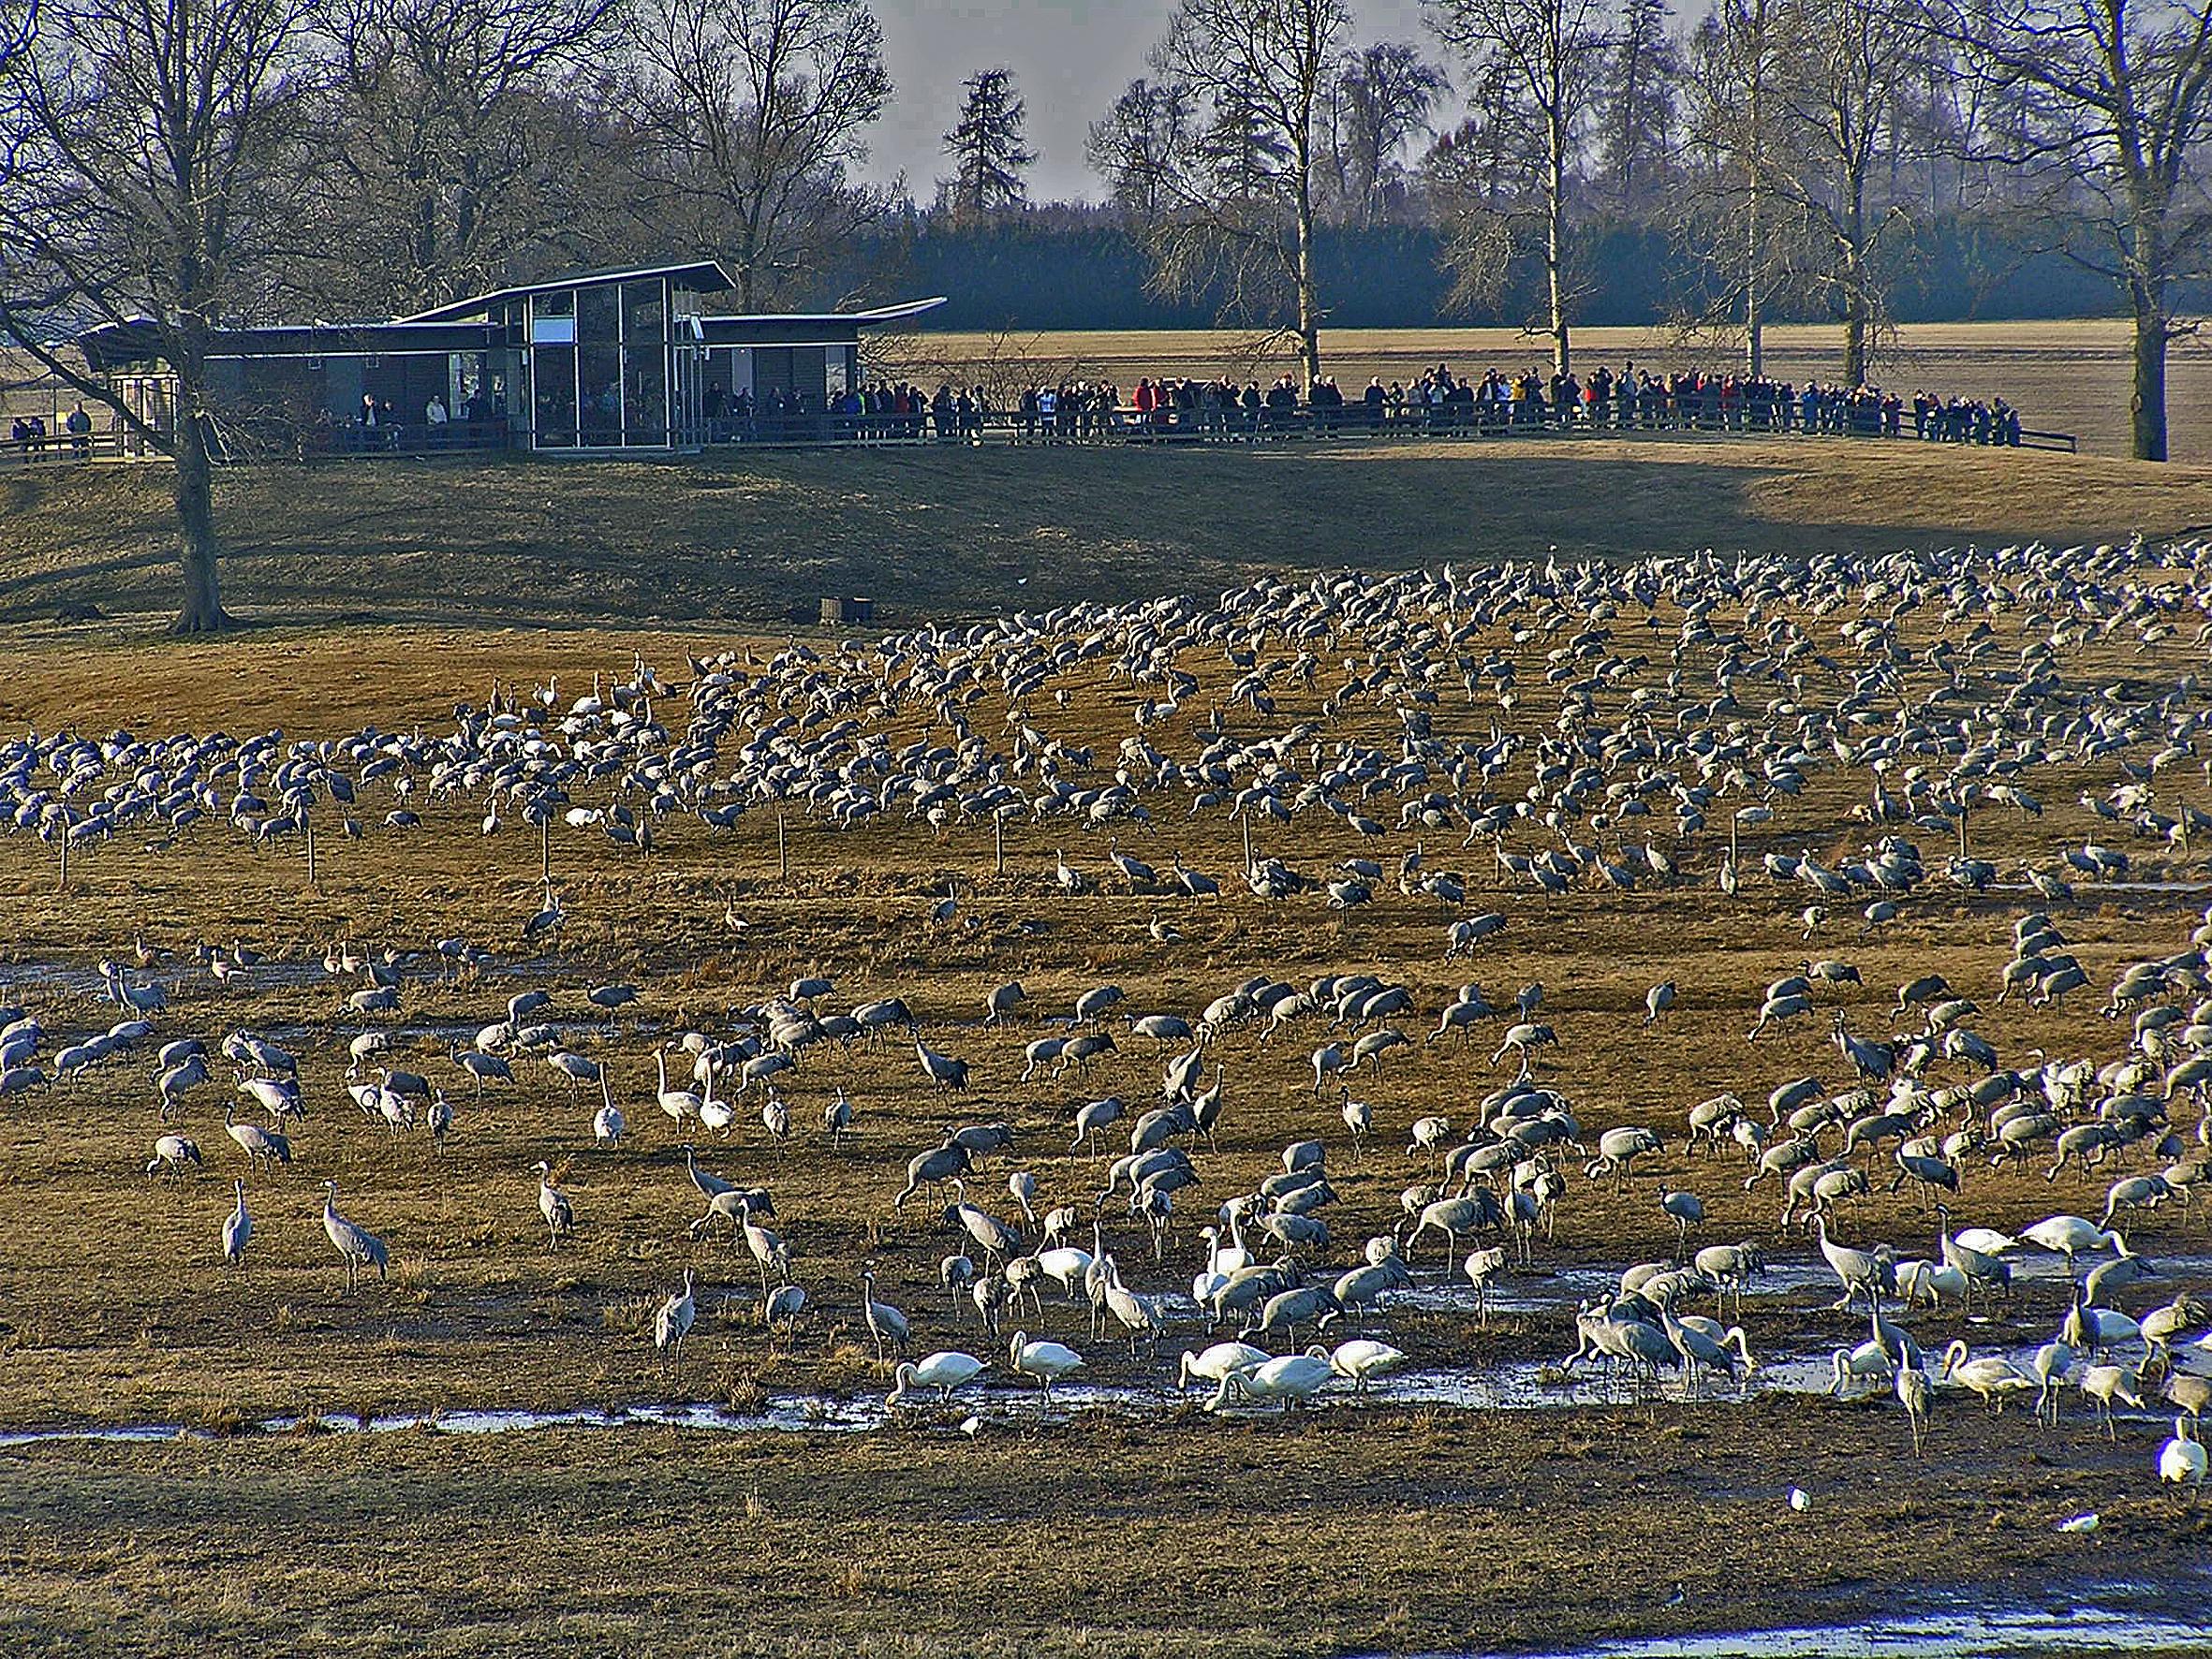 Grhakedopping vid Naturum Hornborgasjn - Picture of